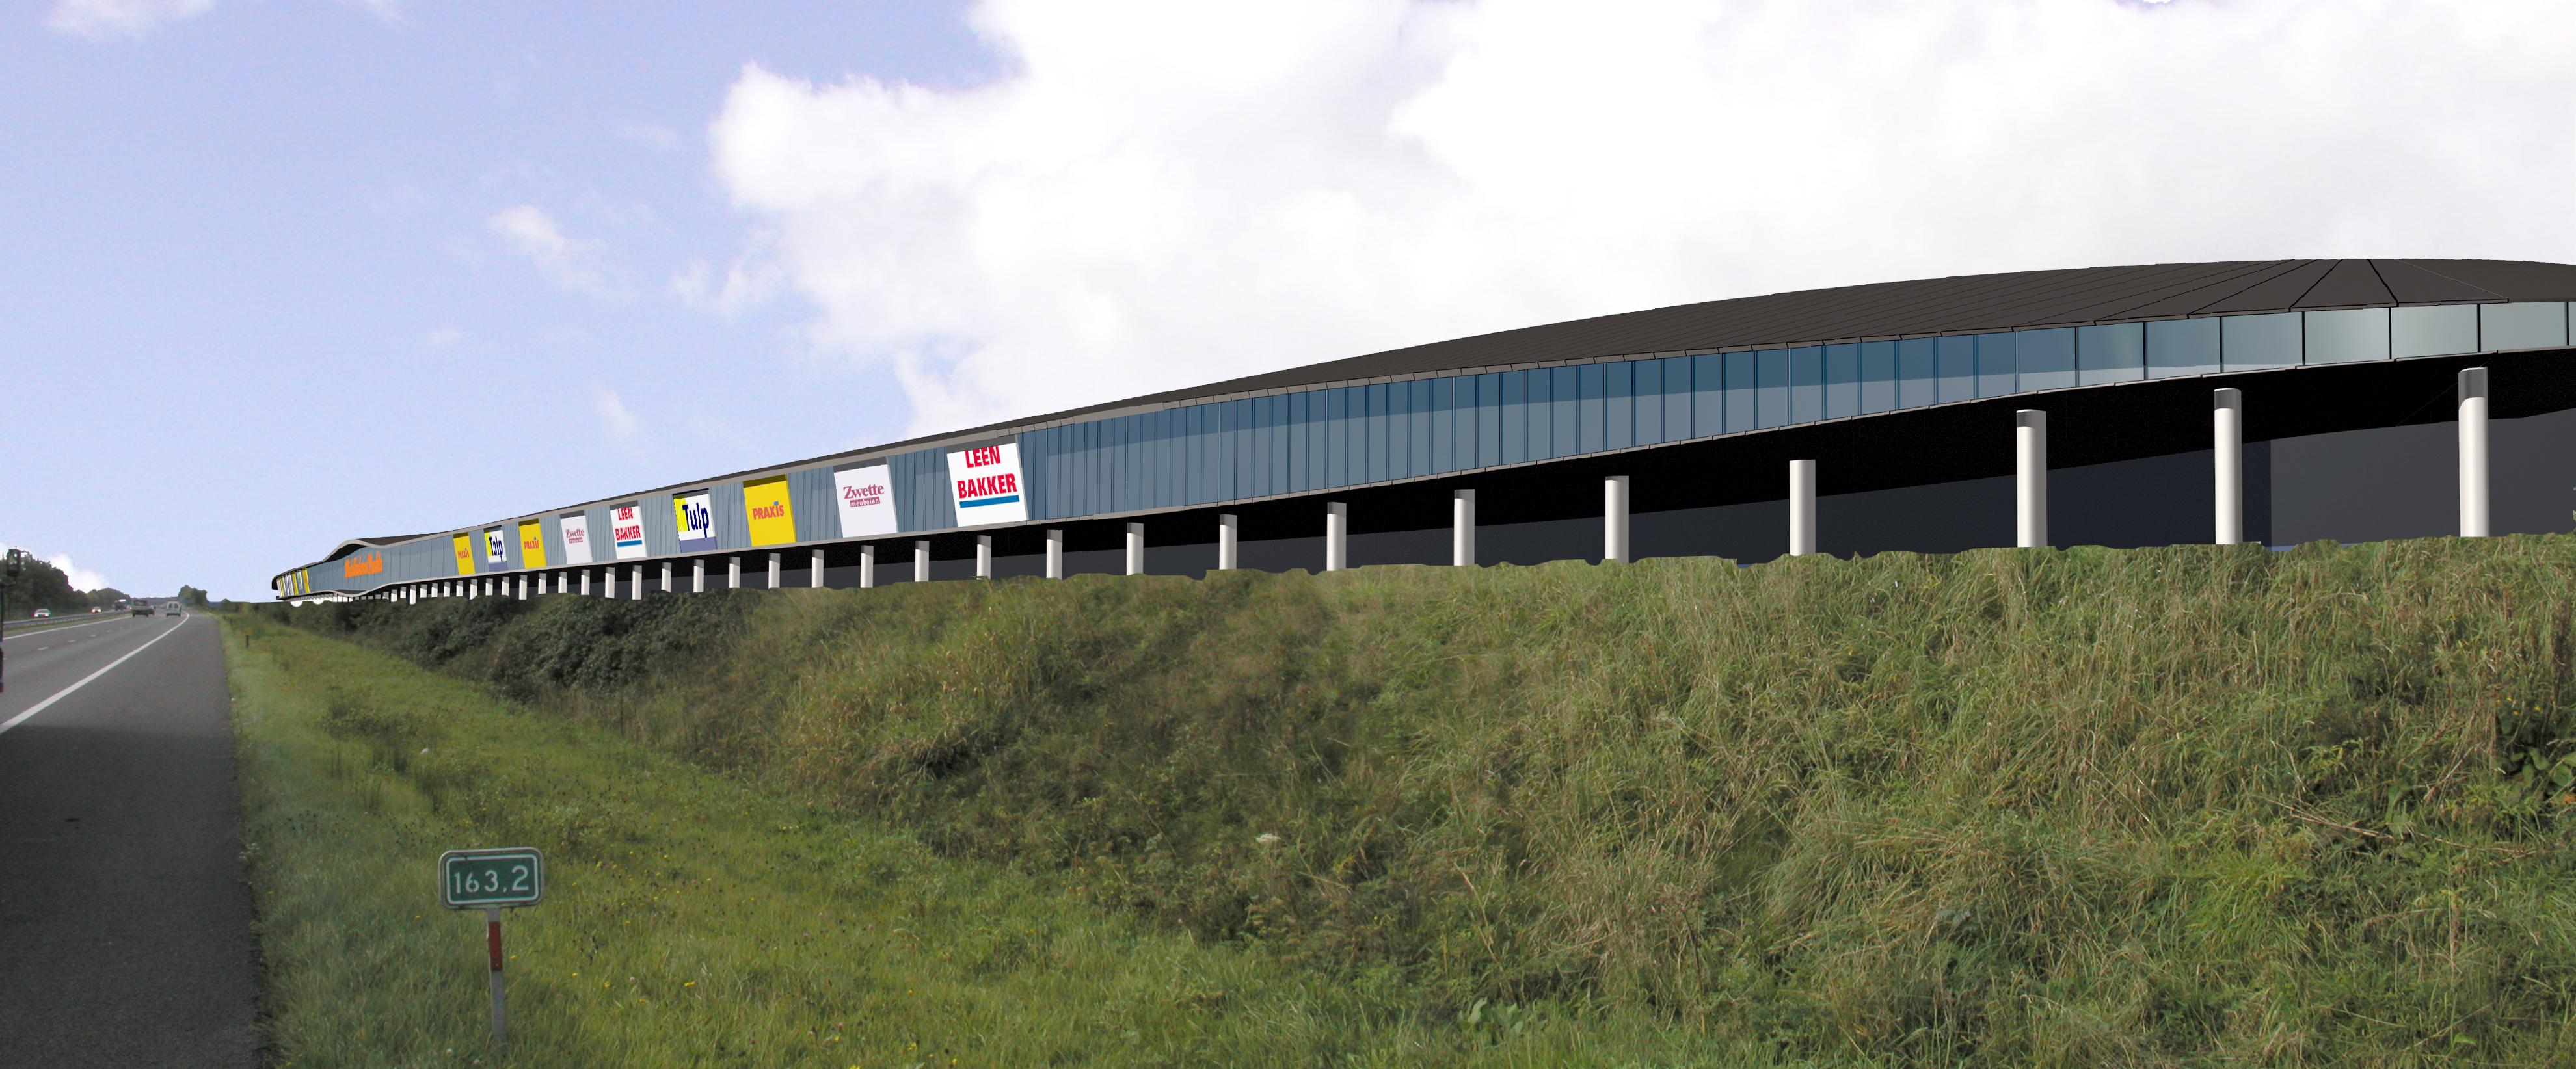 Uitbreiding winkelcentrum Smallingerland